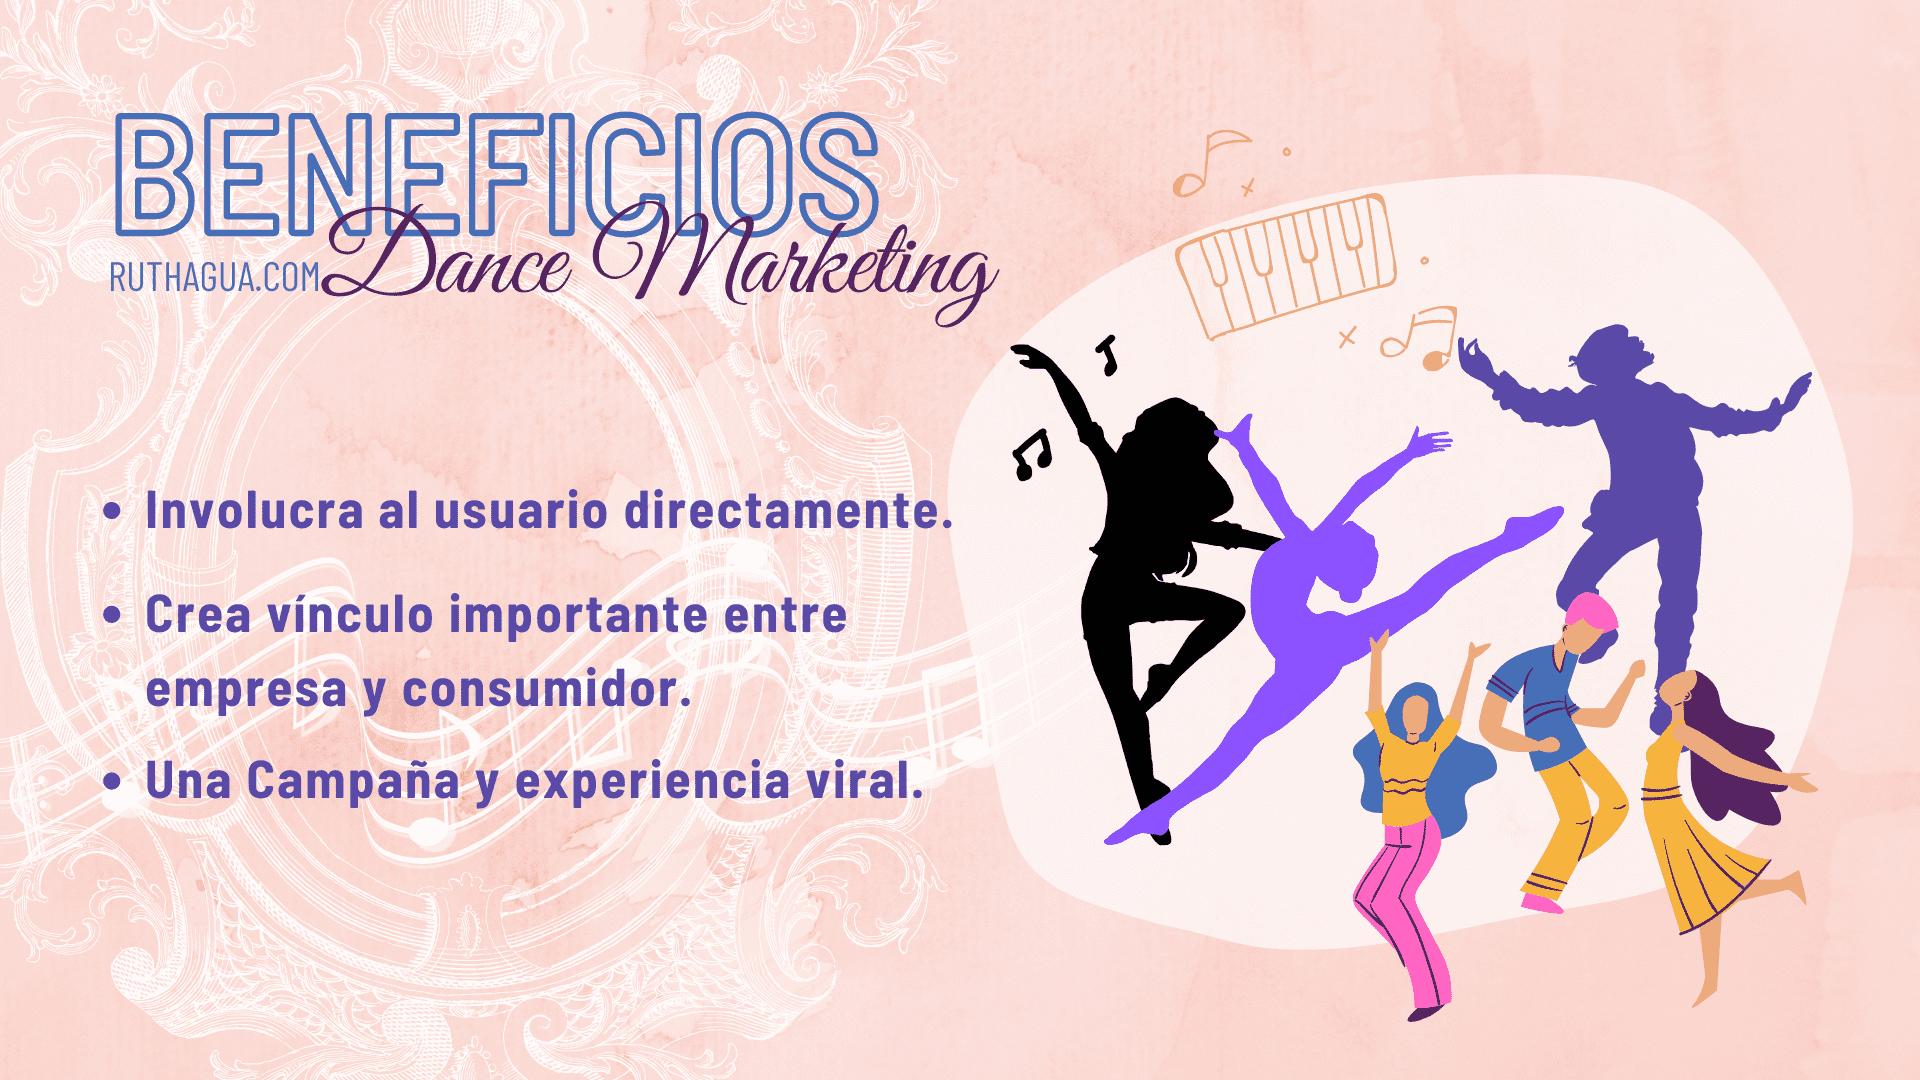 Beneficios de Dance Marketing